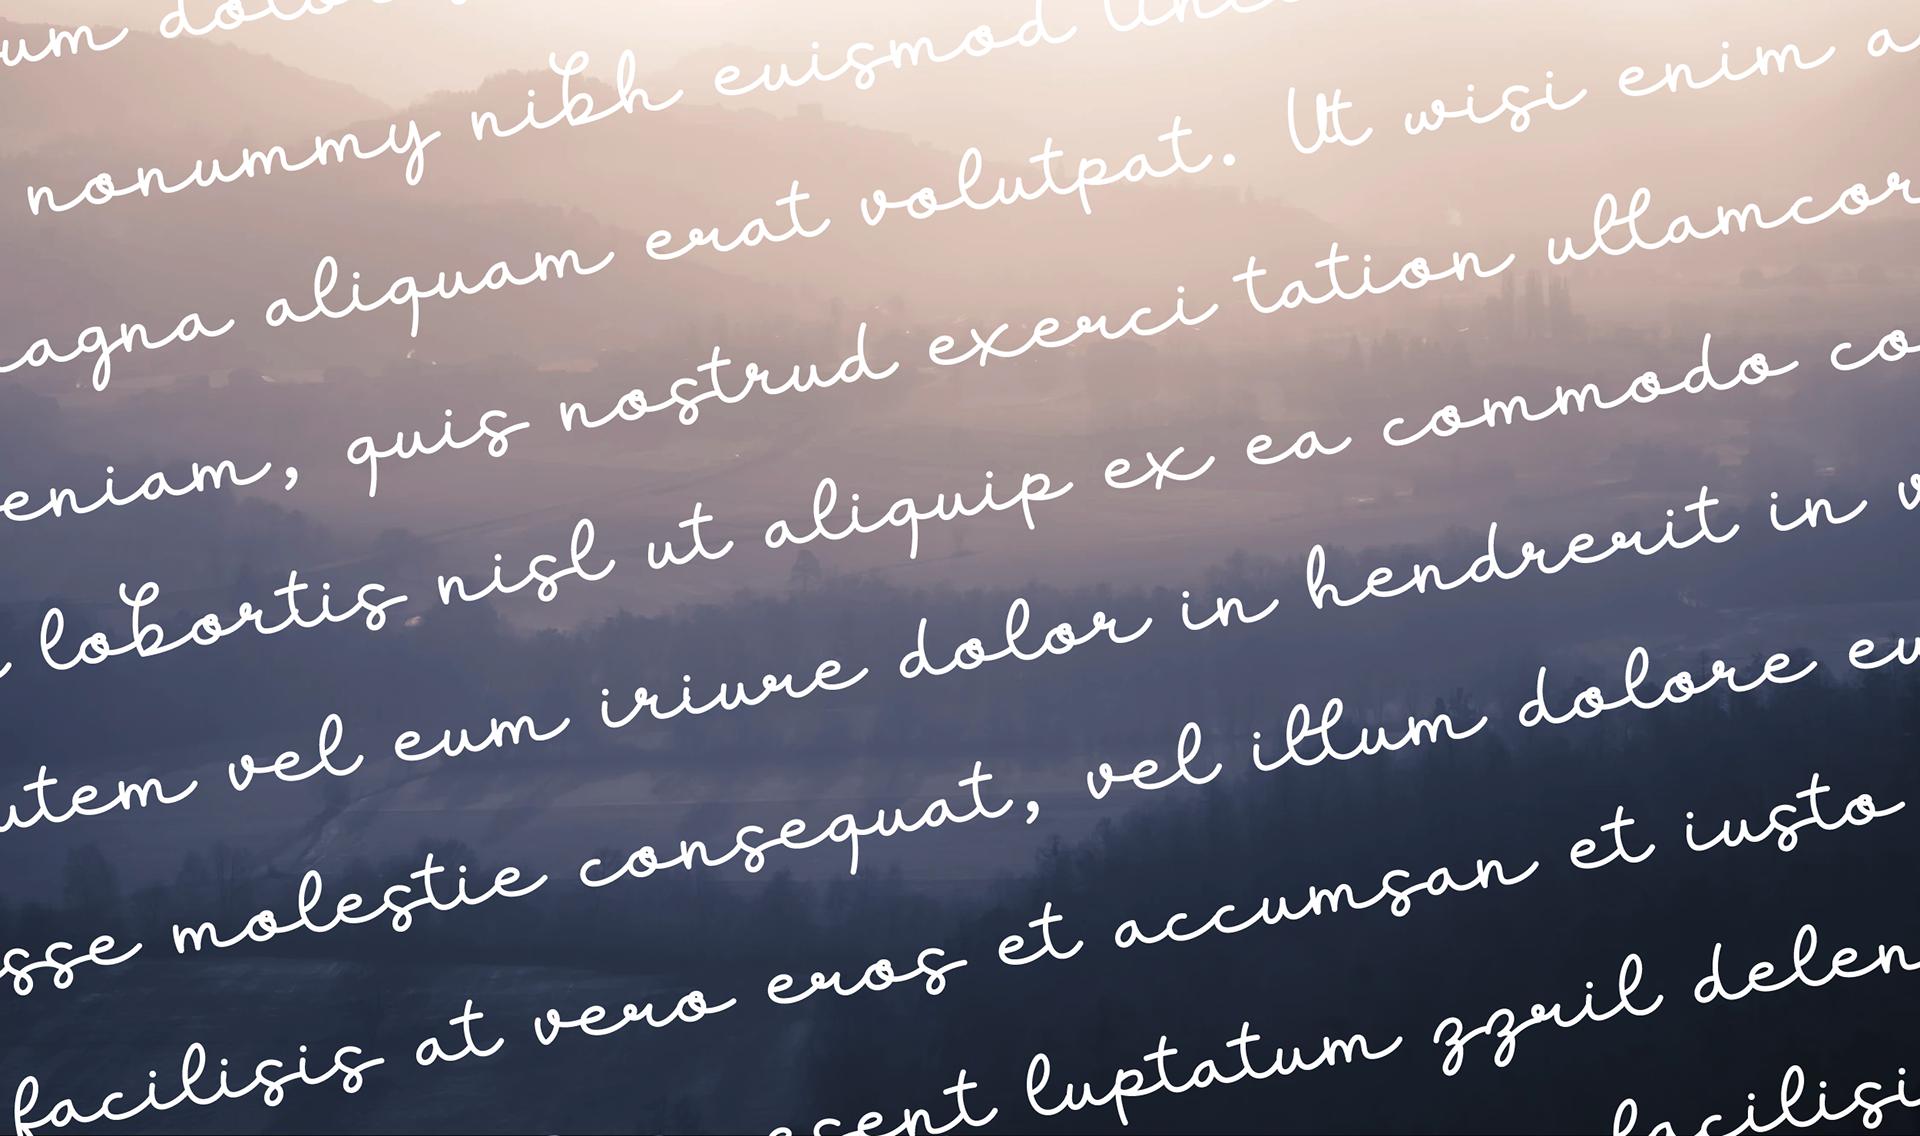 Lifestyle Free Handwritten Font - script